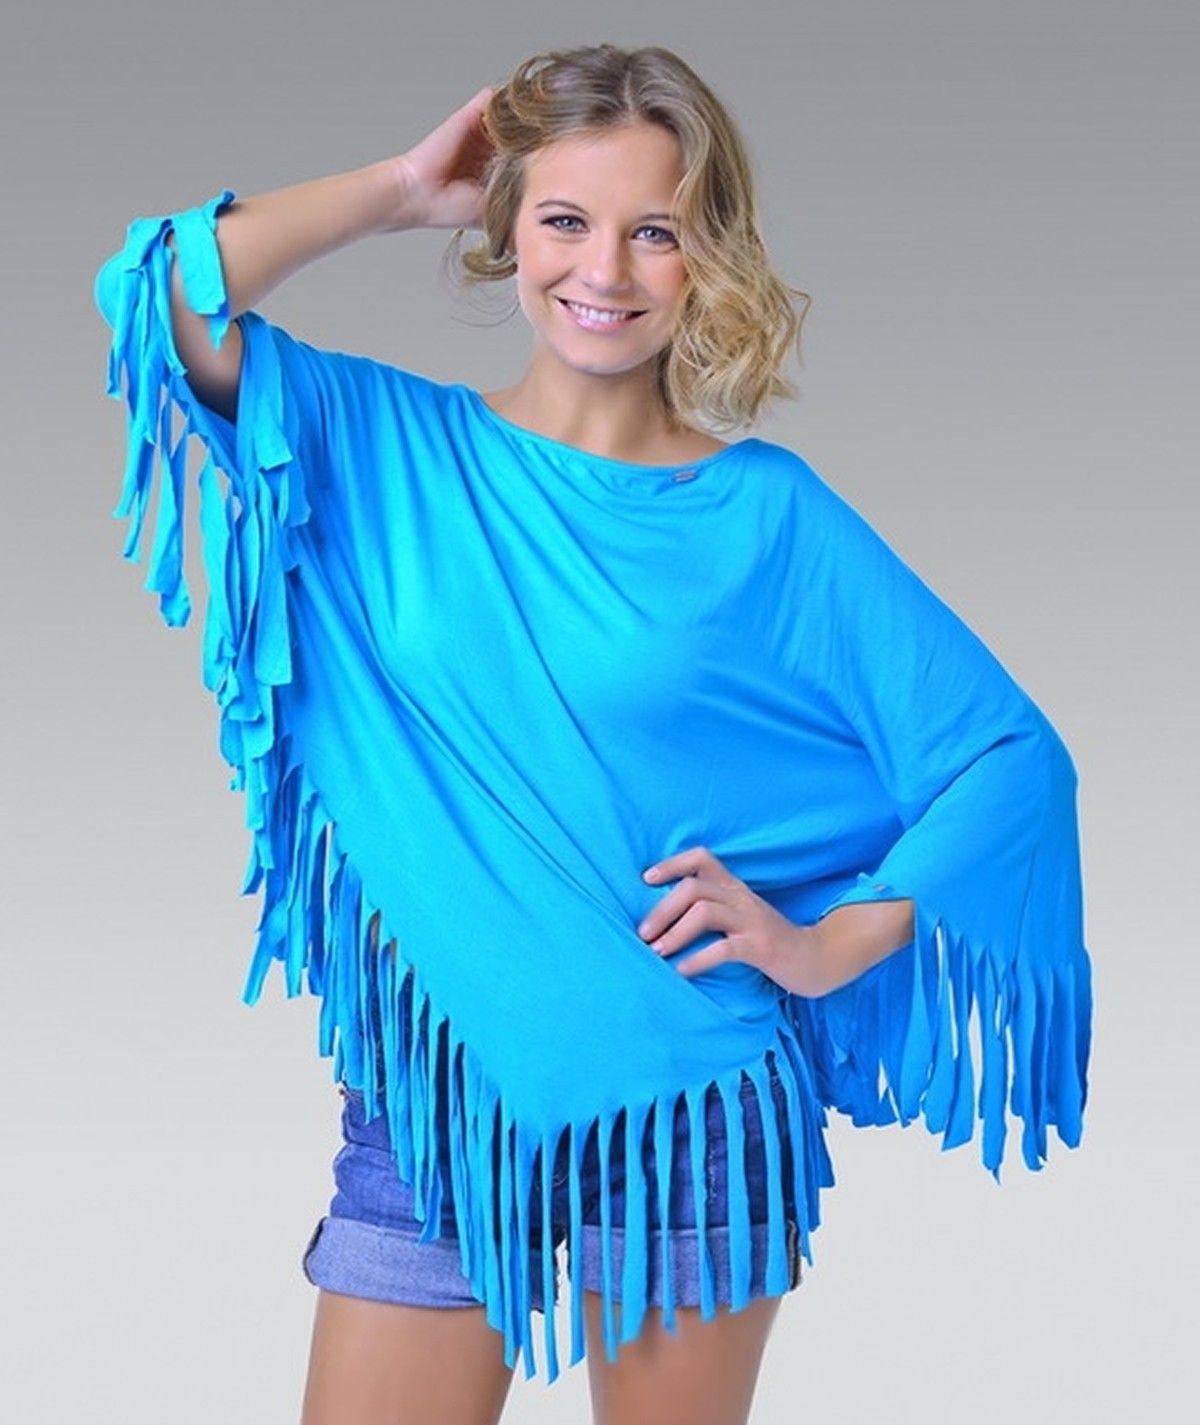 Fringed tunic for women